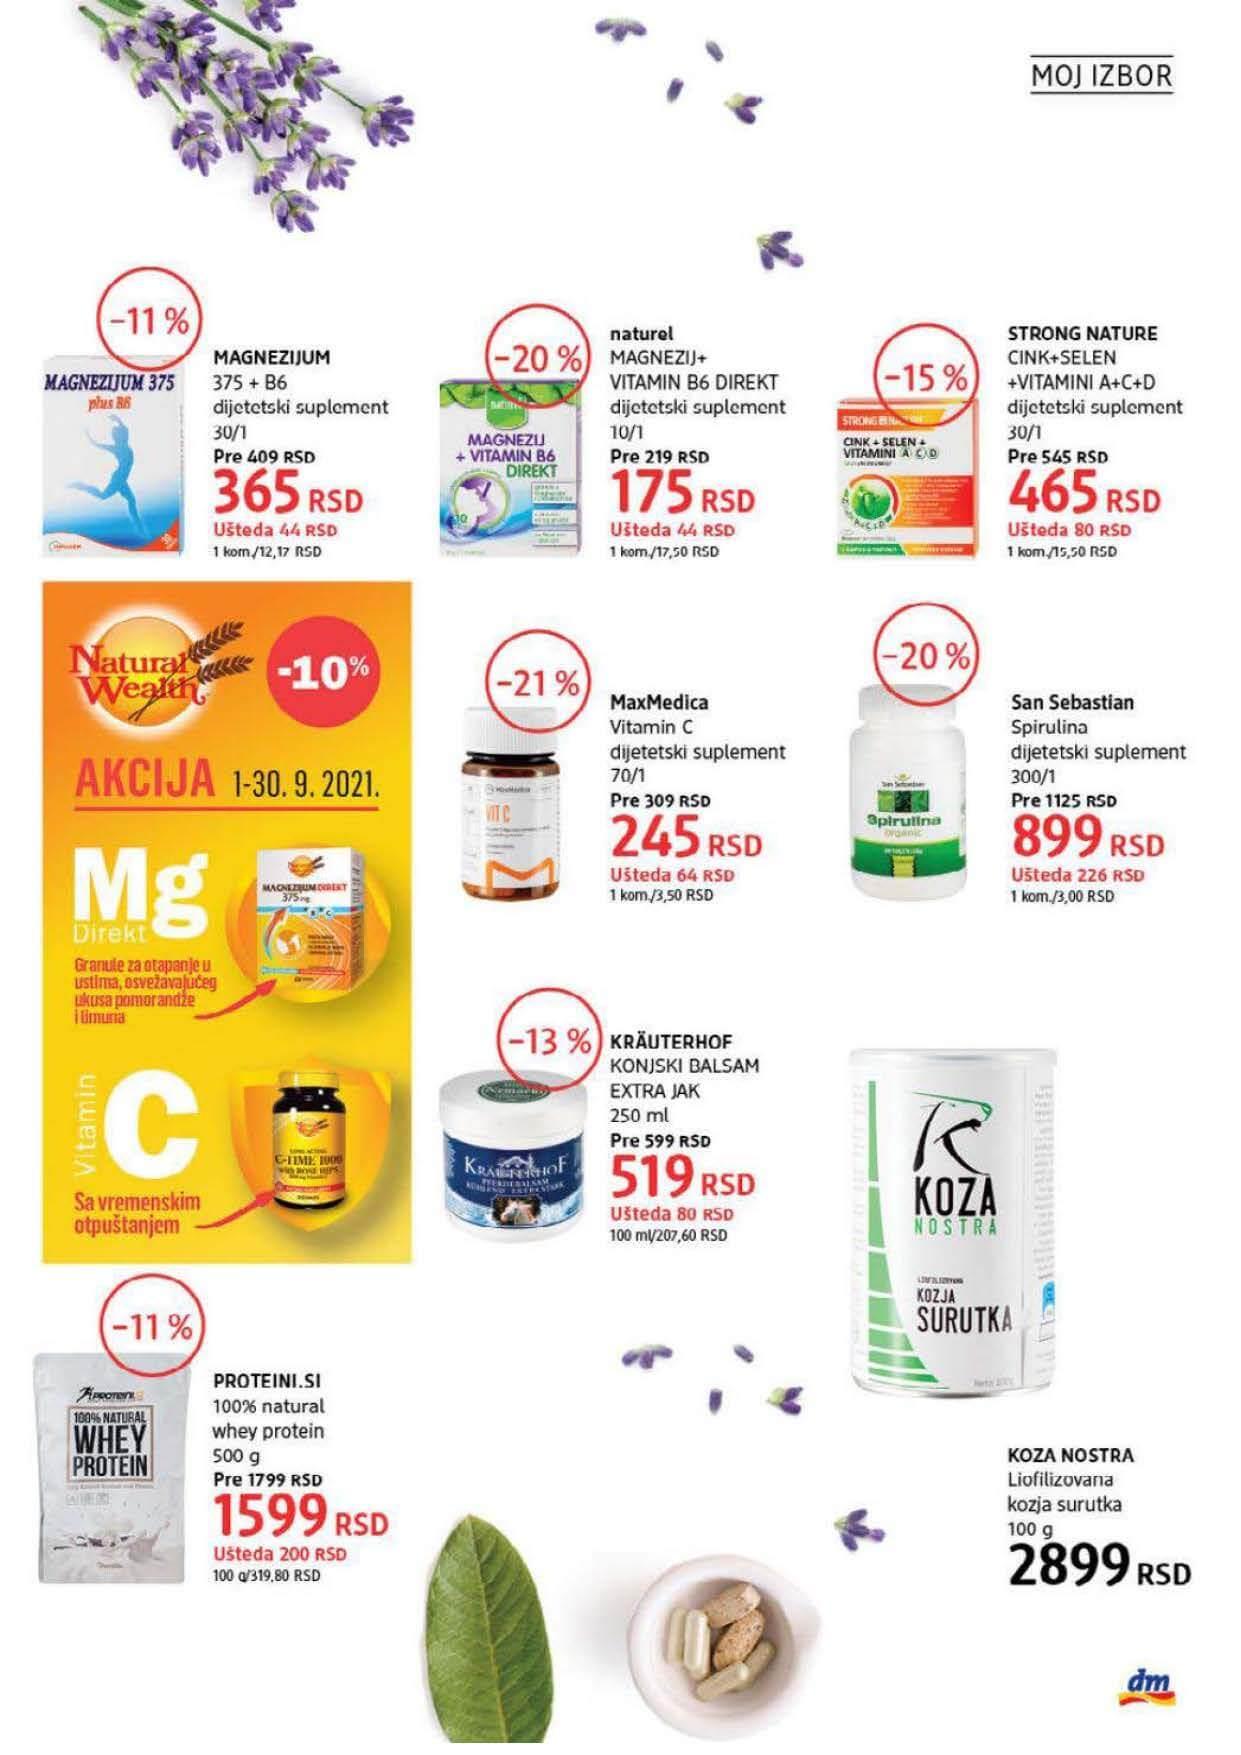 DM Katalog Srbija SEPTEMBAR 2021 1.9.2021. 30.9.2021. Page 31